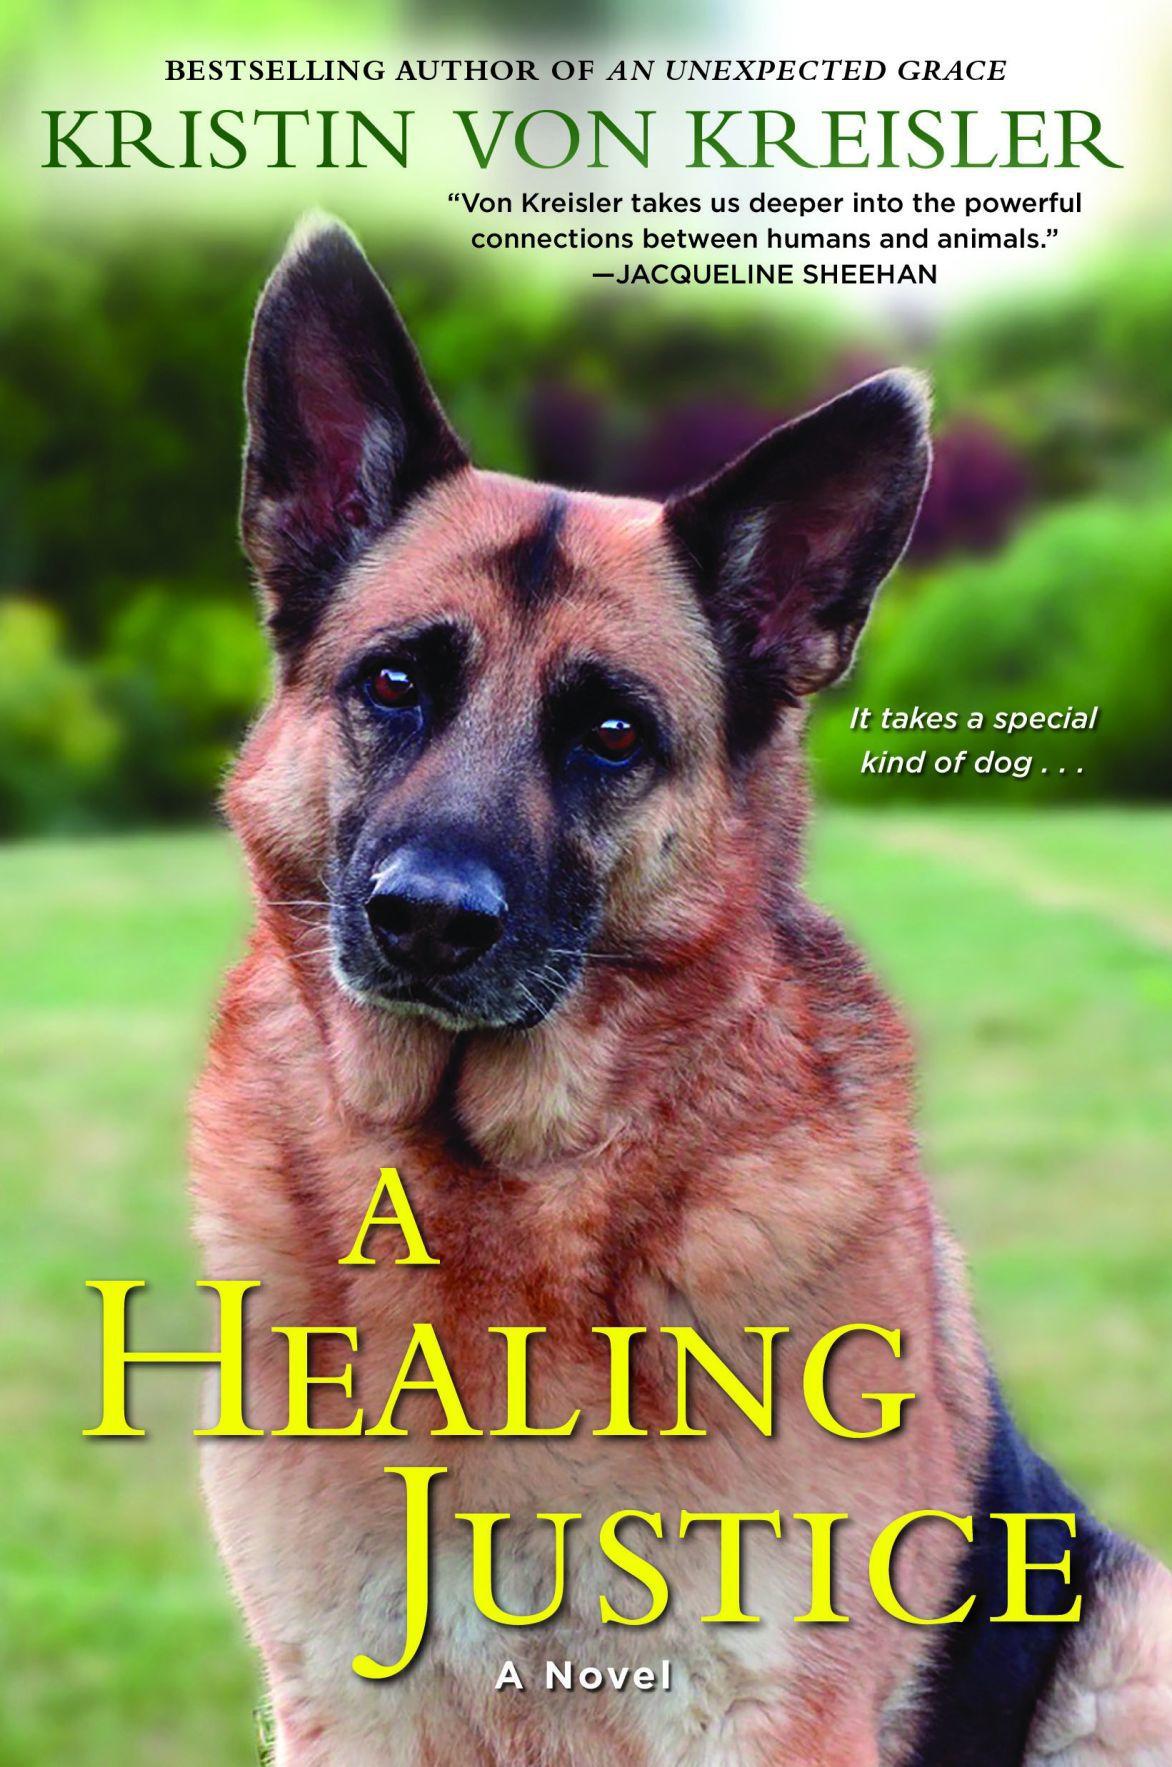 Bookworm Healing Justice a delightful read